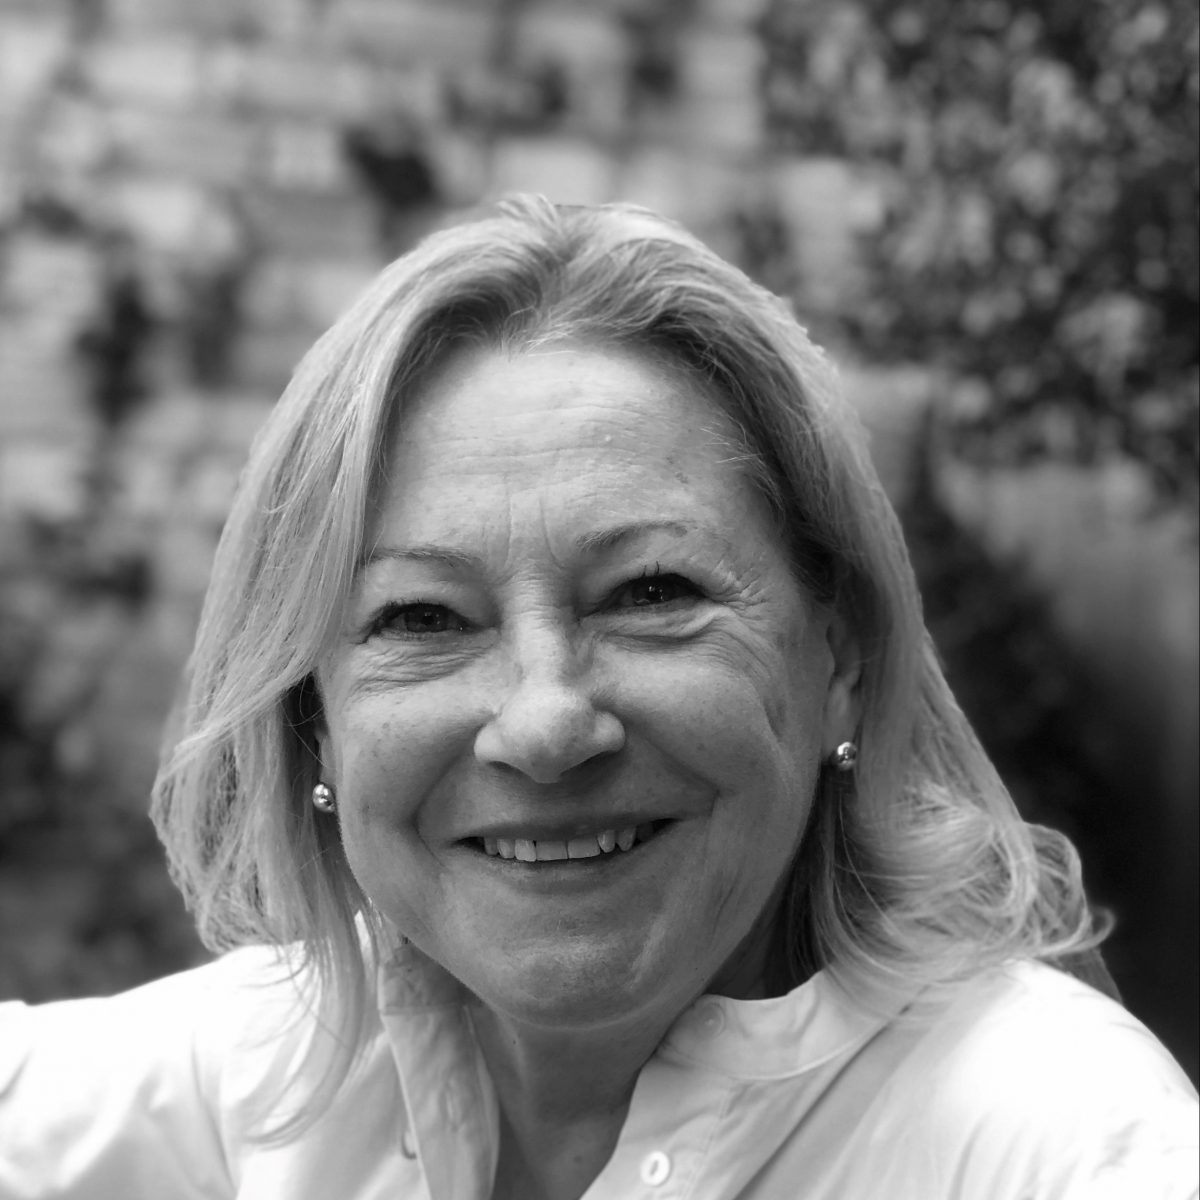 FARA Charity trustee Philippa Gitlin